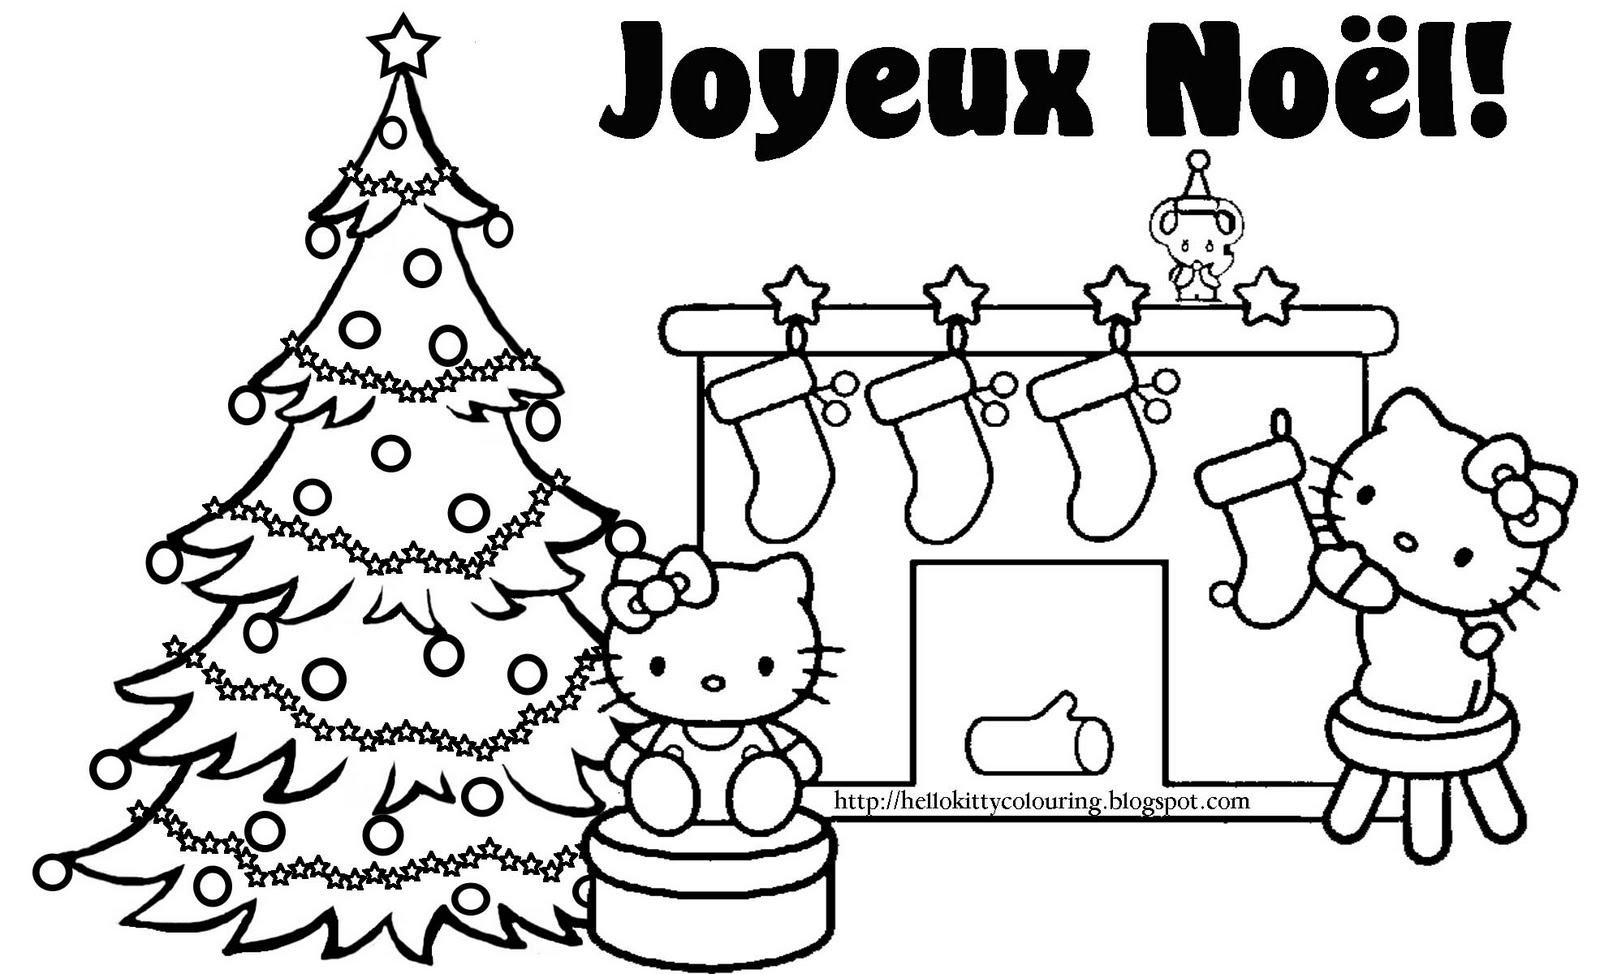 19 Dessins De Coloriage Hello Kitty Noel À Imprimer concernant Coloriage A Imprimer Hello Kitty